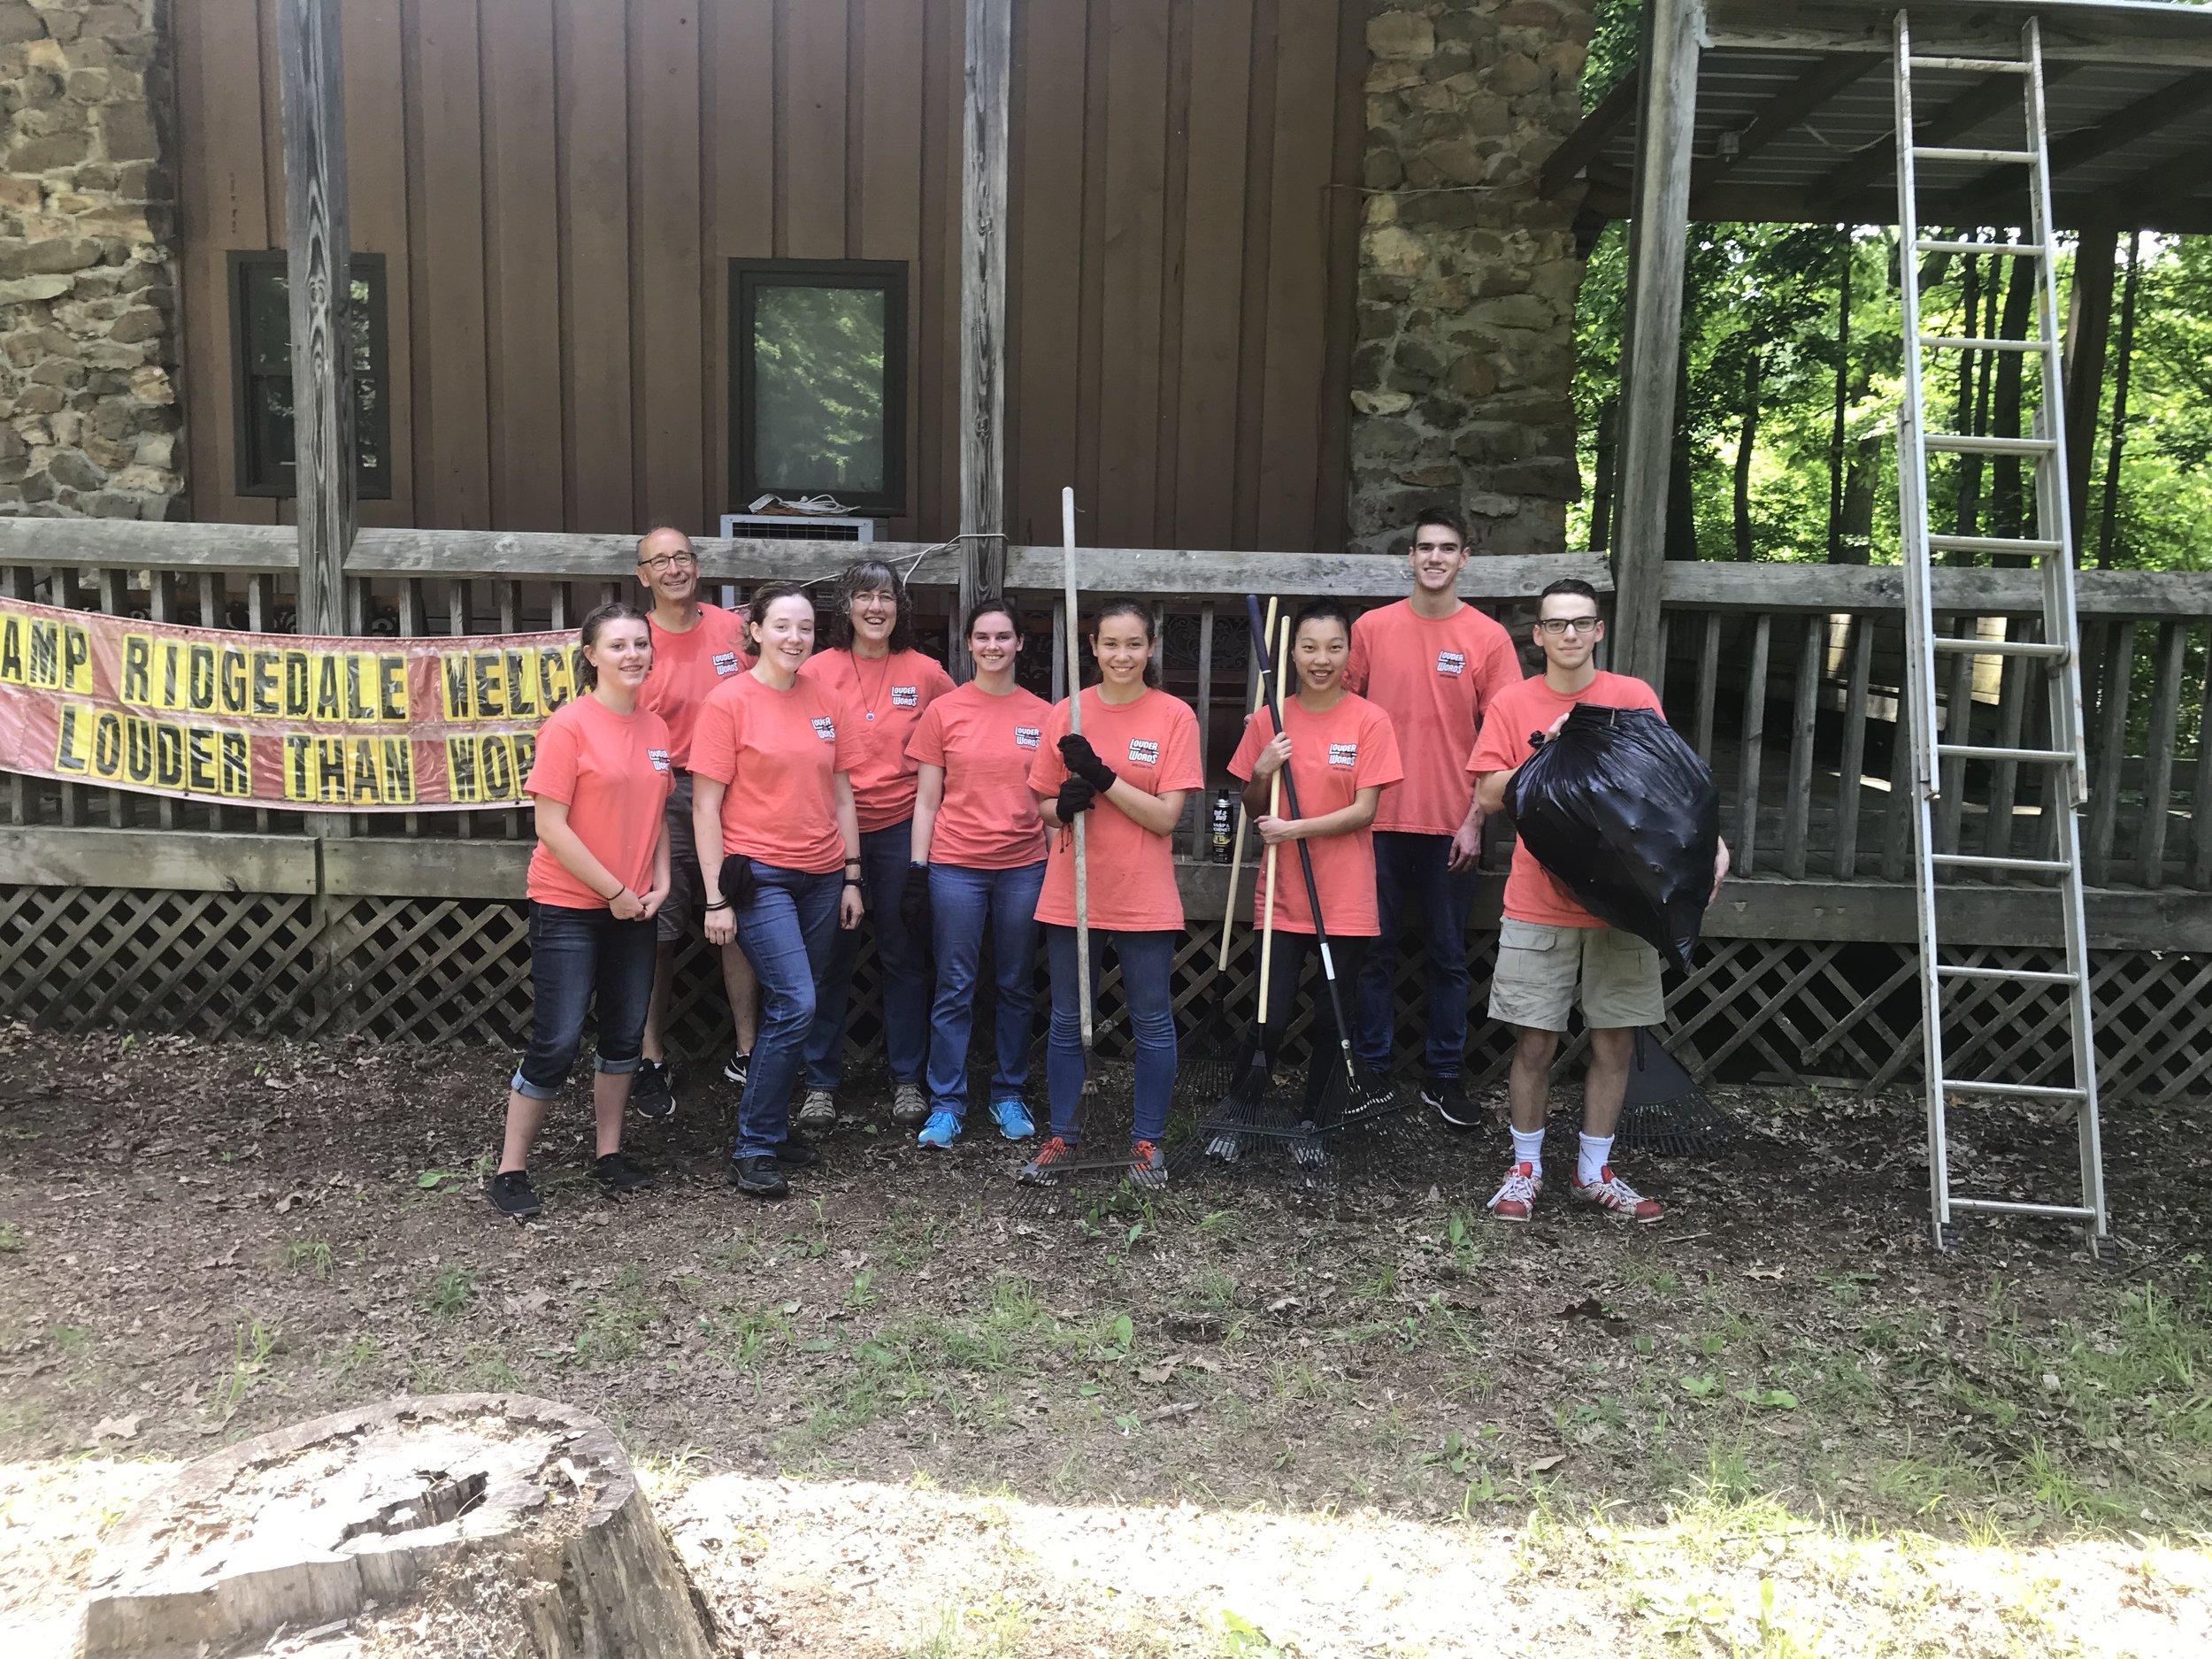 Camp ridgedale, tn; xpression 2019